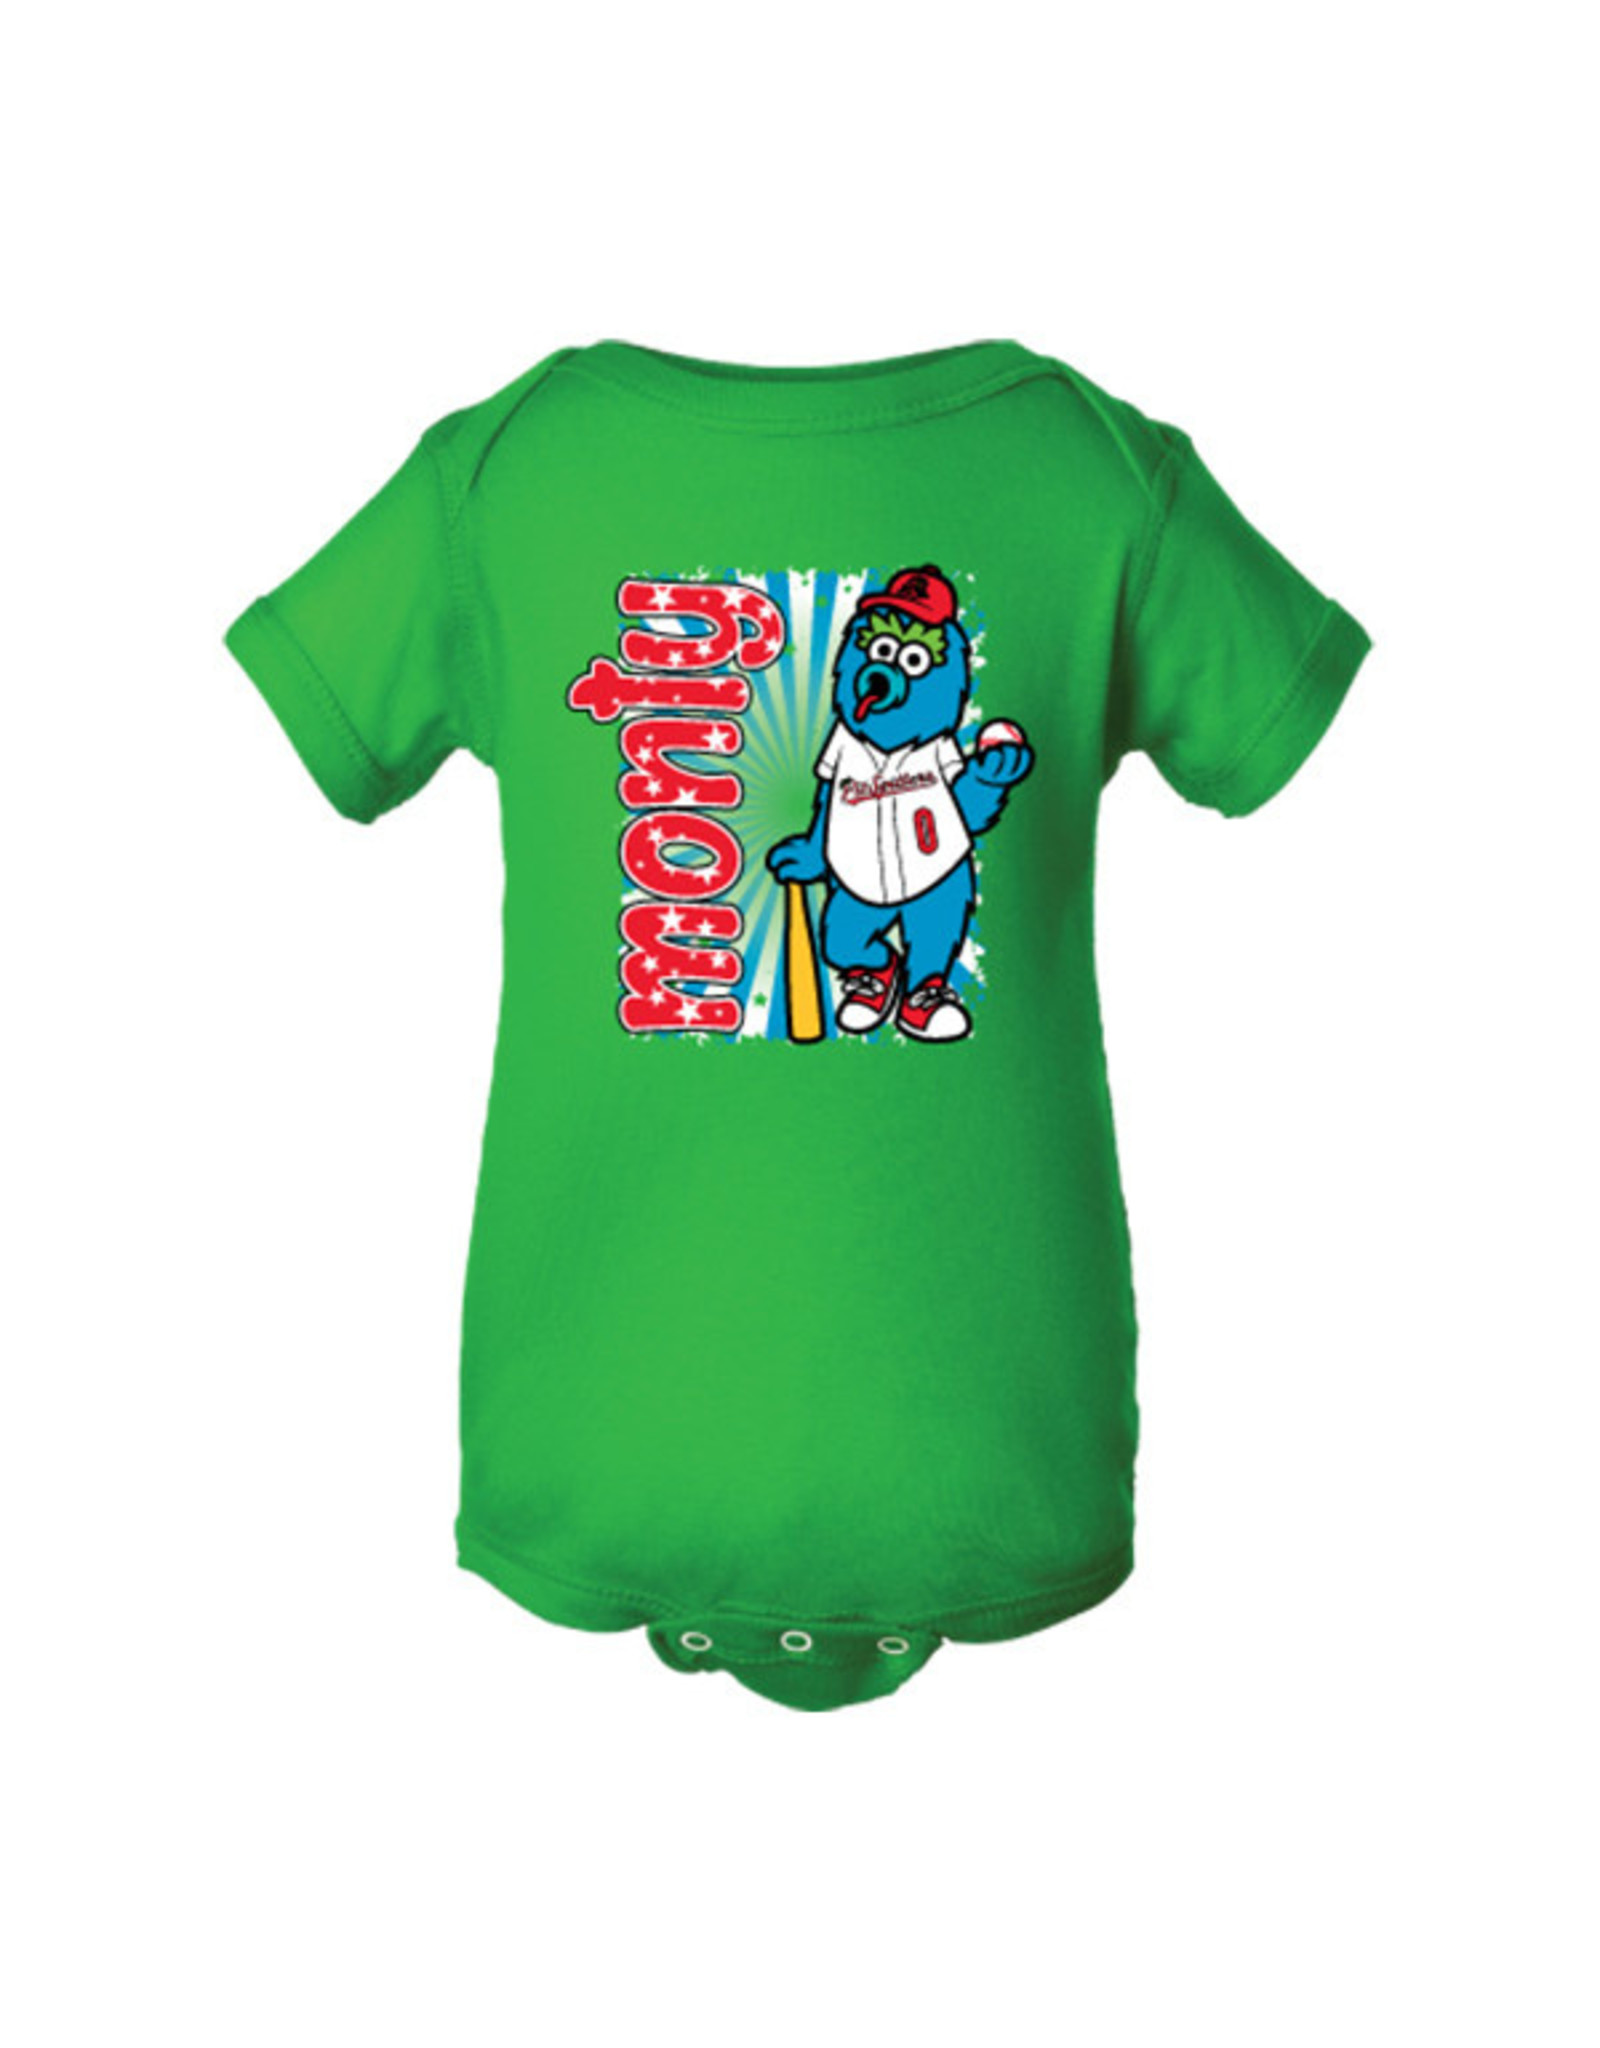 2960 Infant Monty Mascot Green Onesie